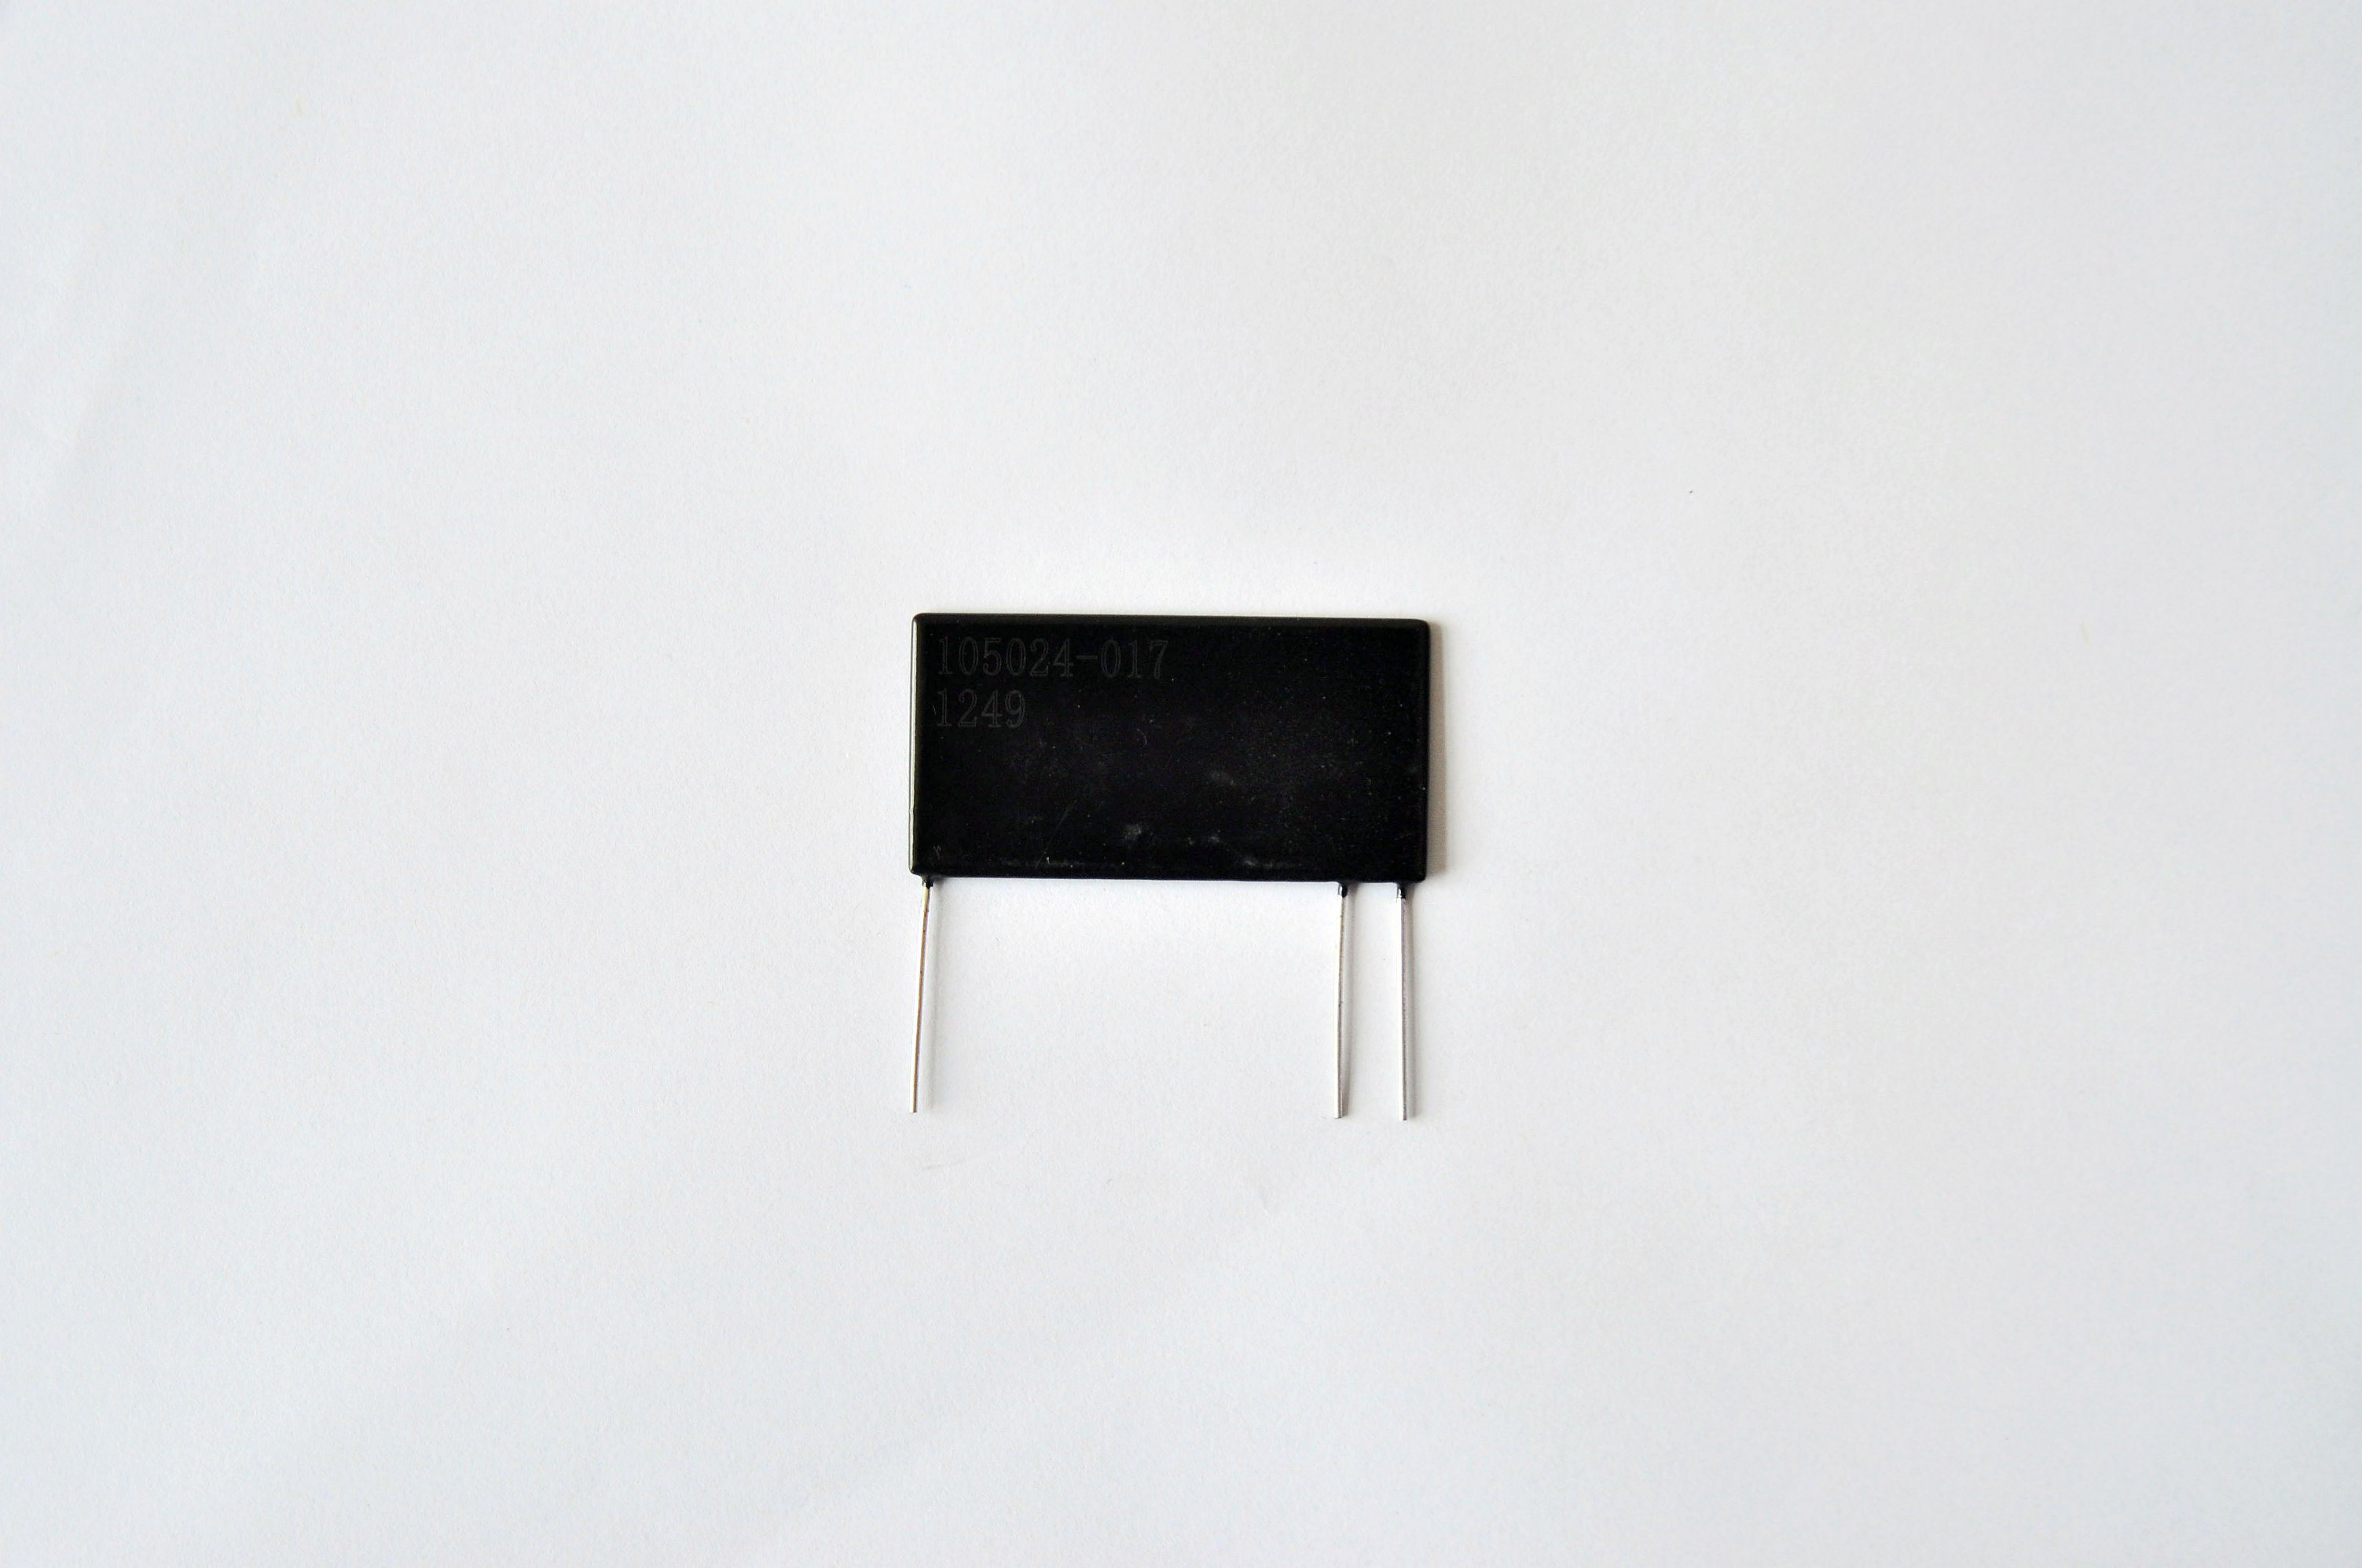 Flat High Voltage Divider